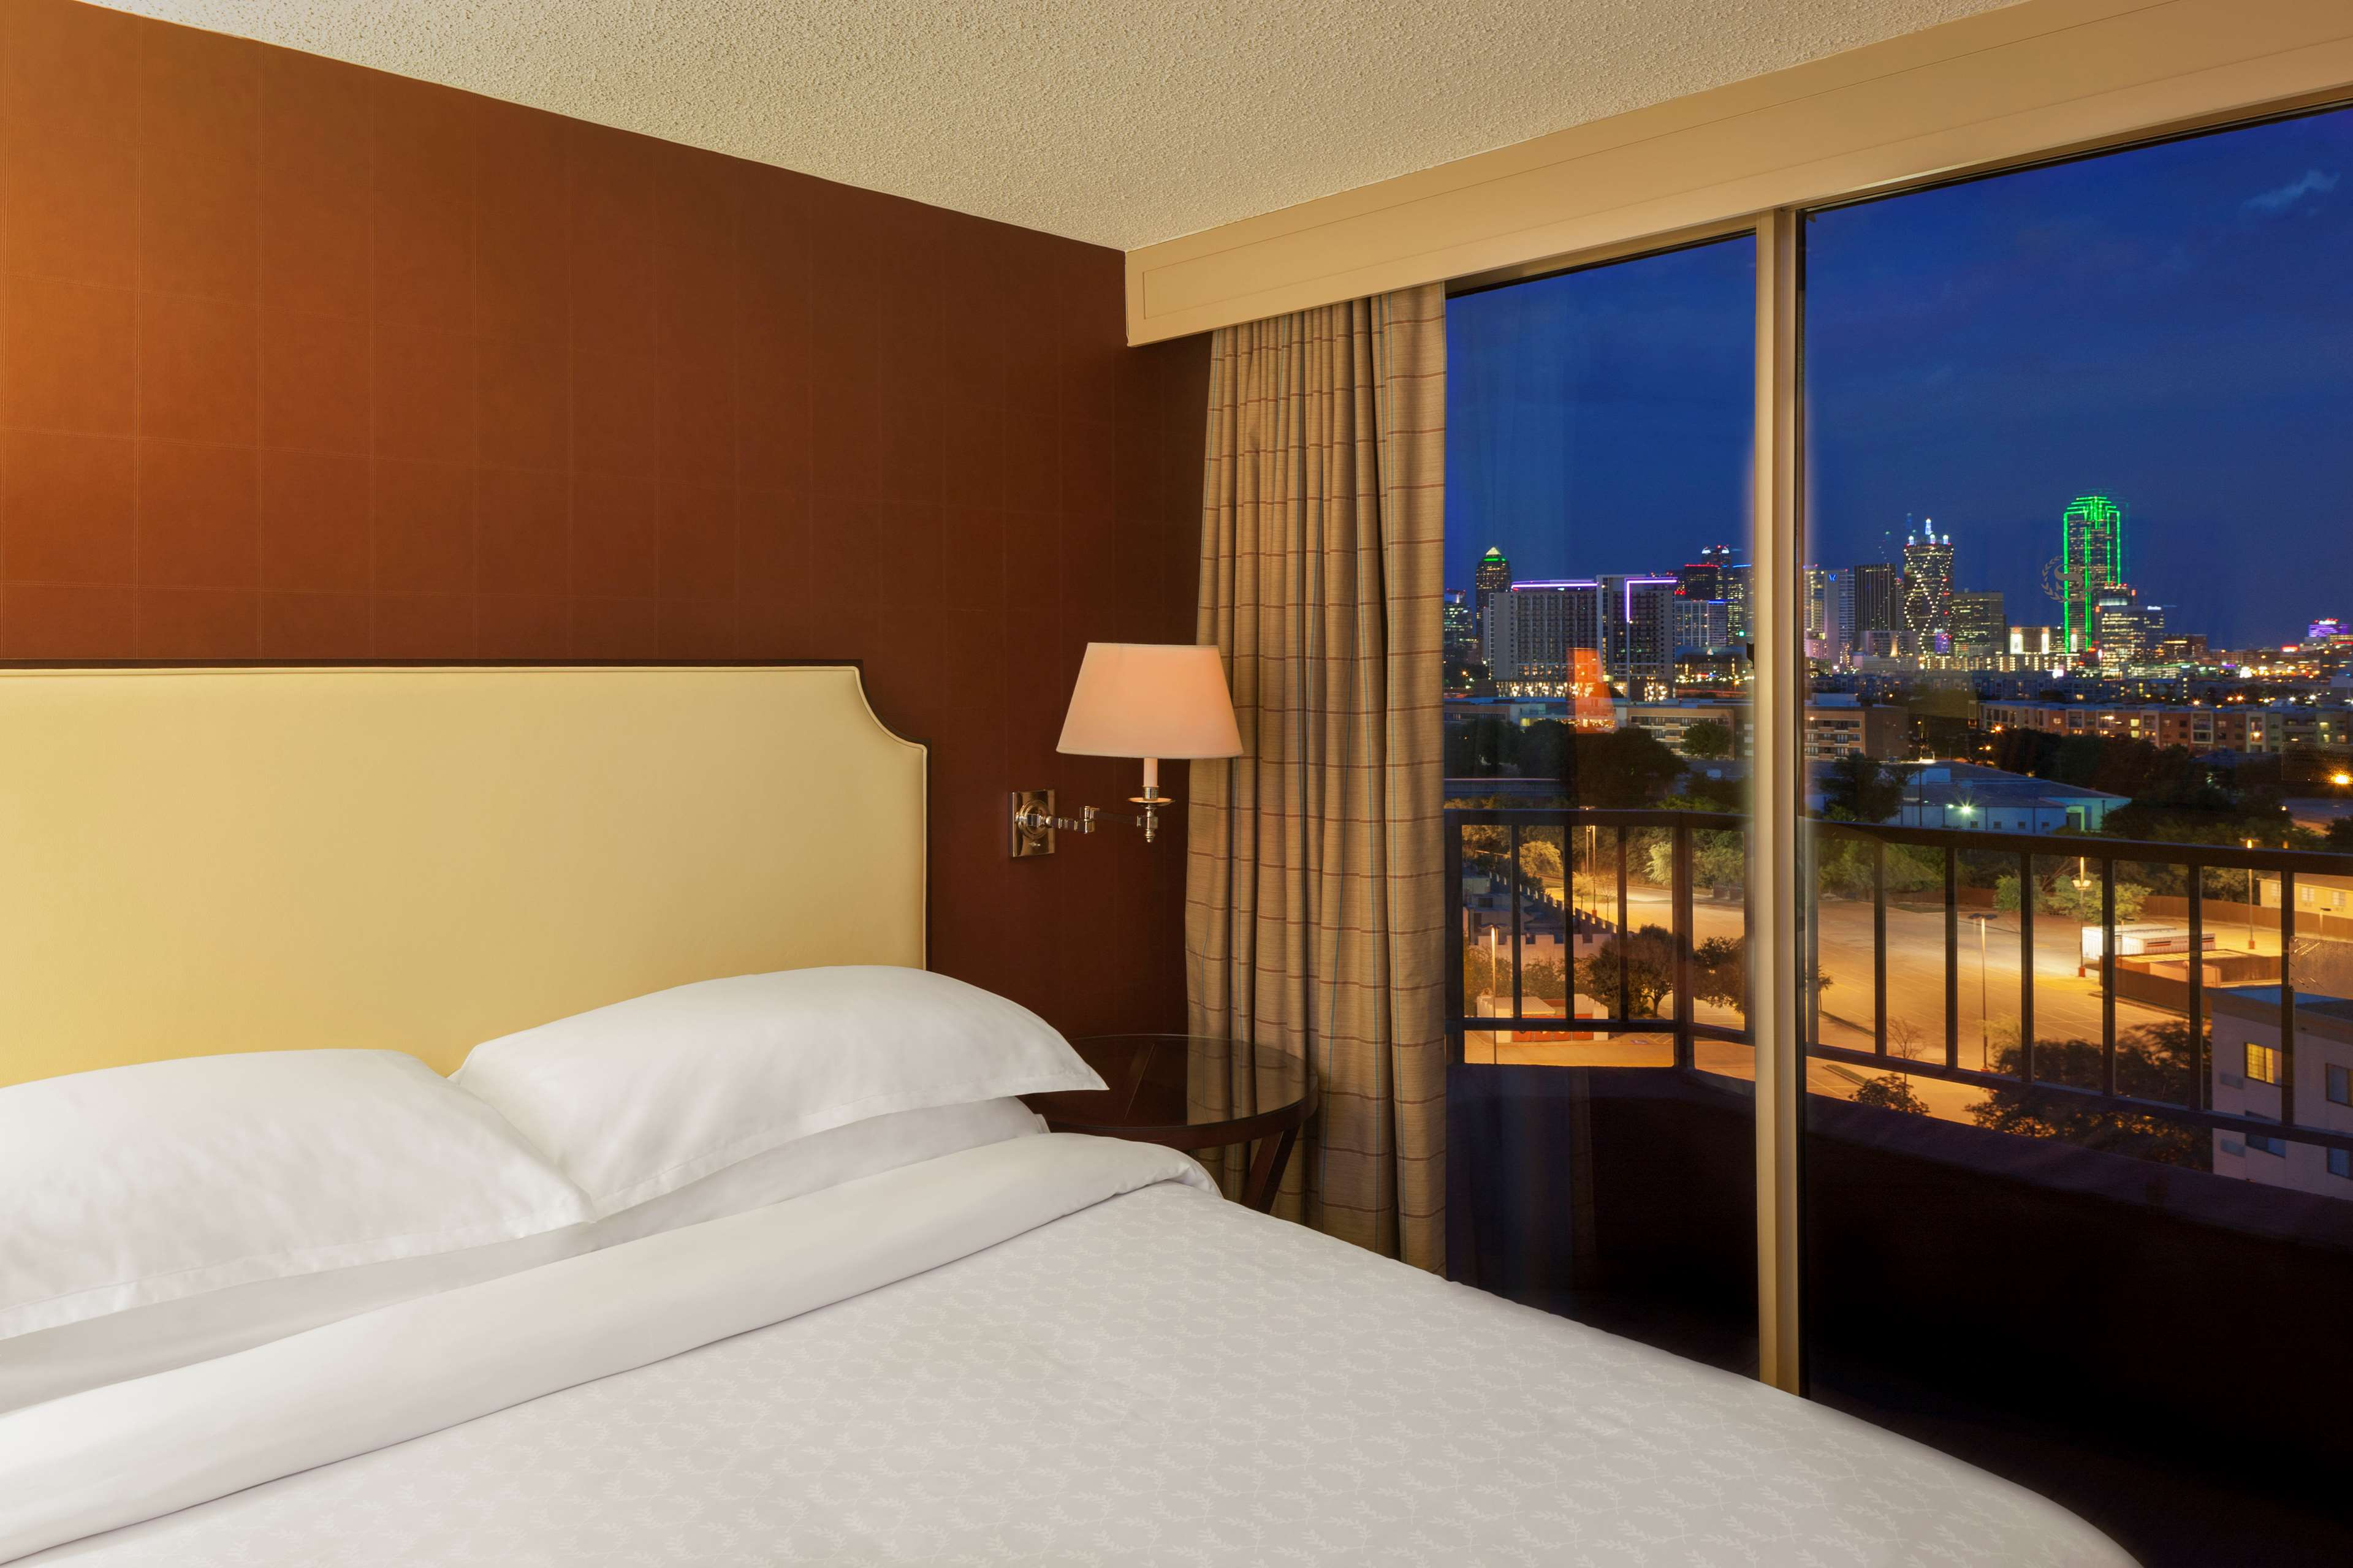 Sheraton Suites Market Center Dallas image 4